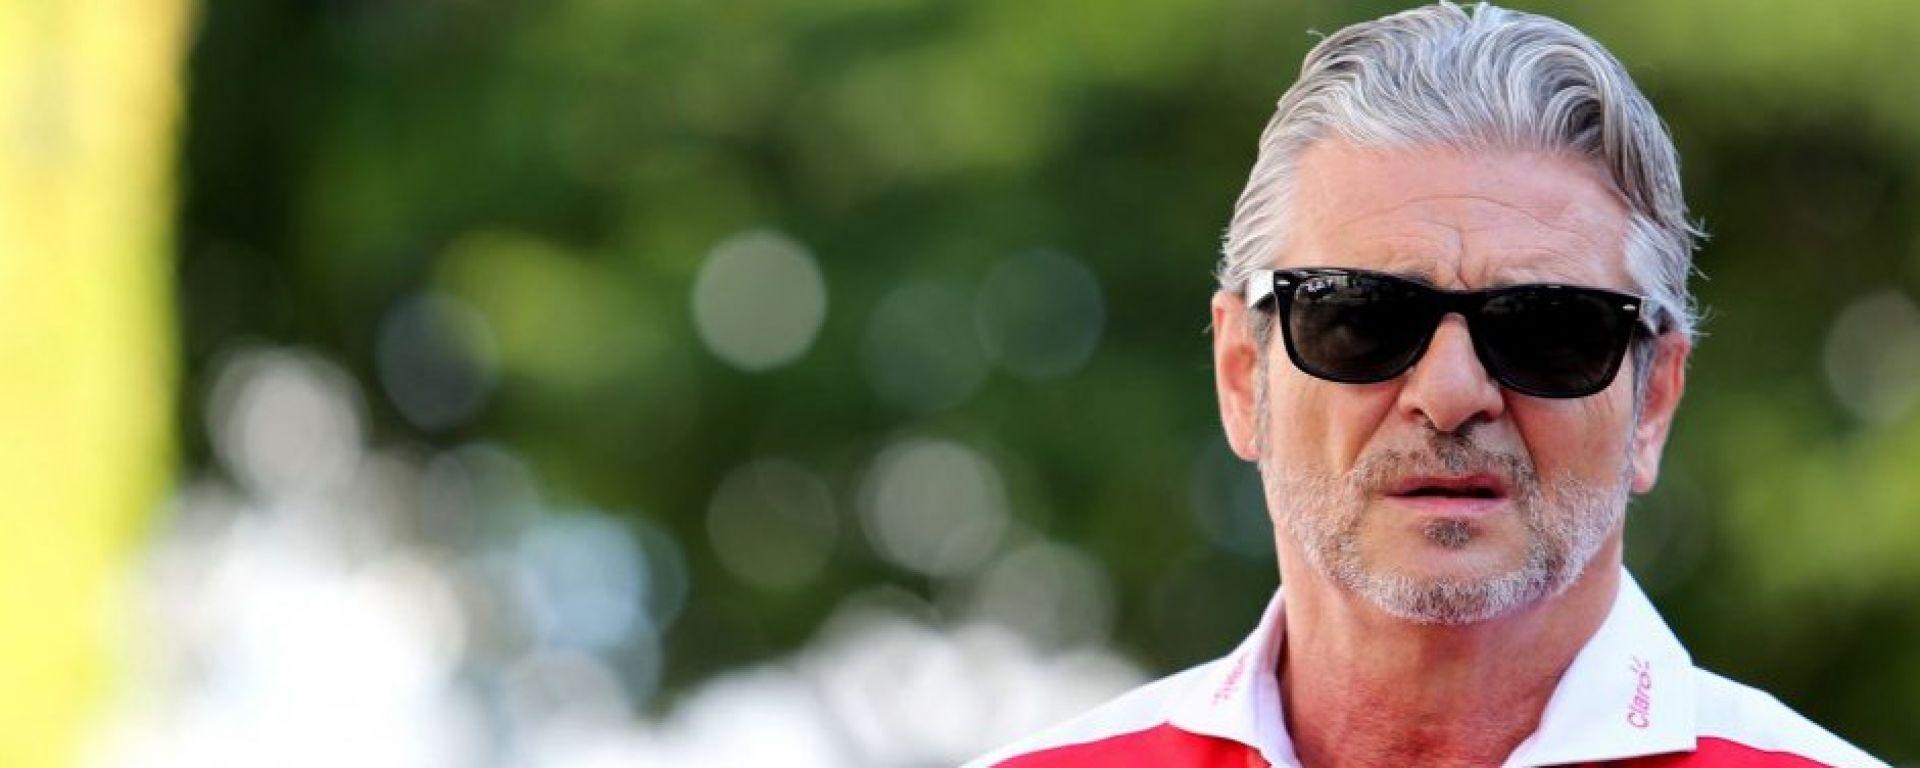 F1 GP Singapore: Arrivabene difende le strategie del team Ferrari